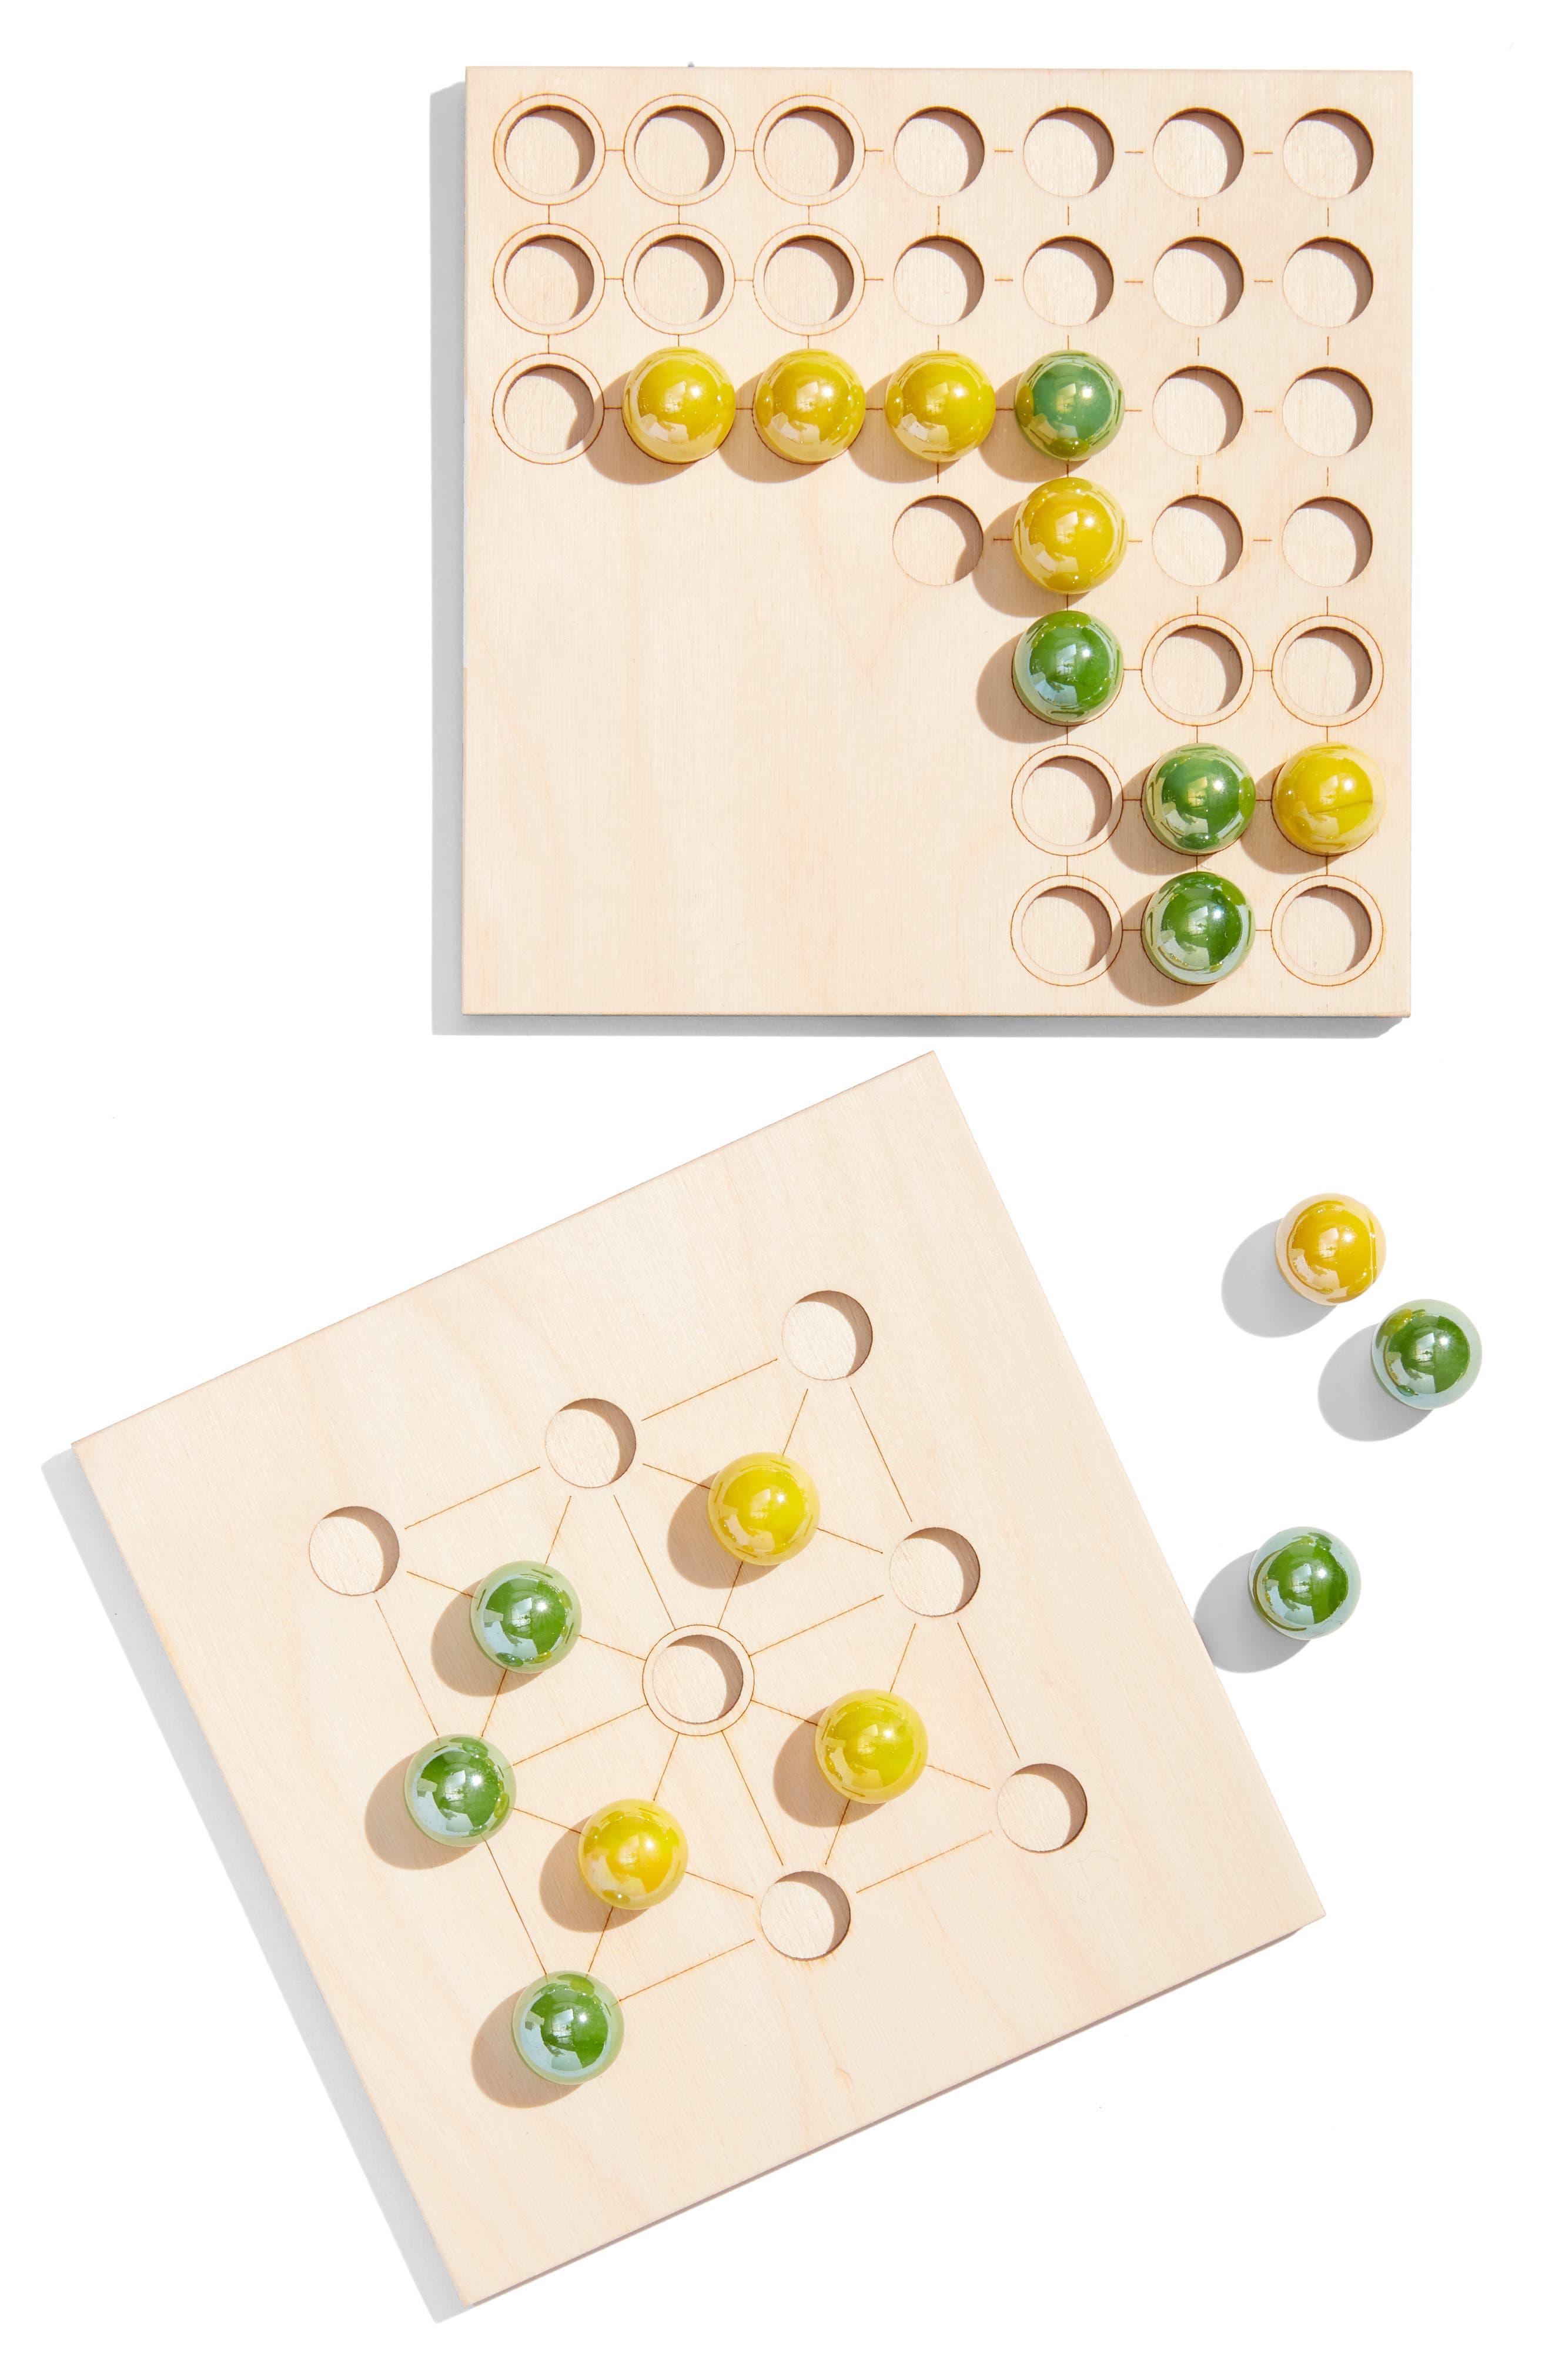 Bright Beam Good Marble Games,                             Main thumbnail 1, color,                             YELLOW/ GREEN